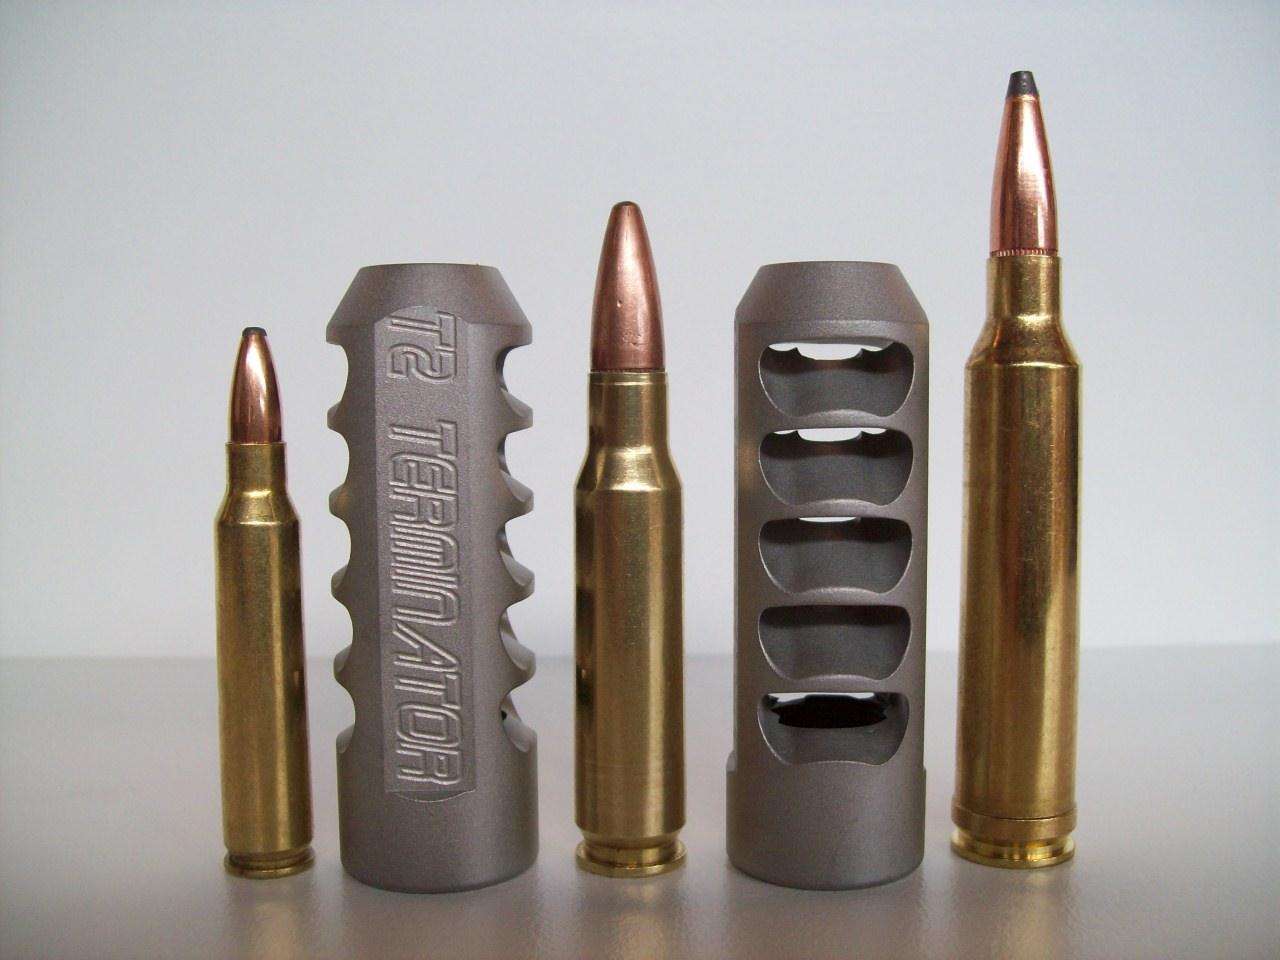 Terminator Muzzle Brakes T1 T2 T3 T4 T5 T6 TT T3B TA TE